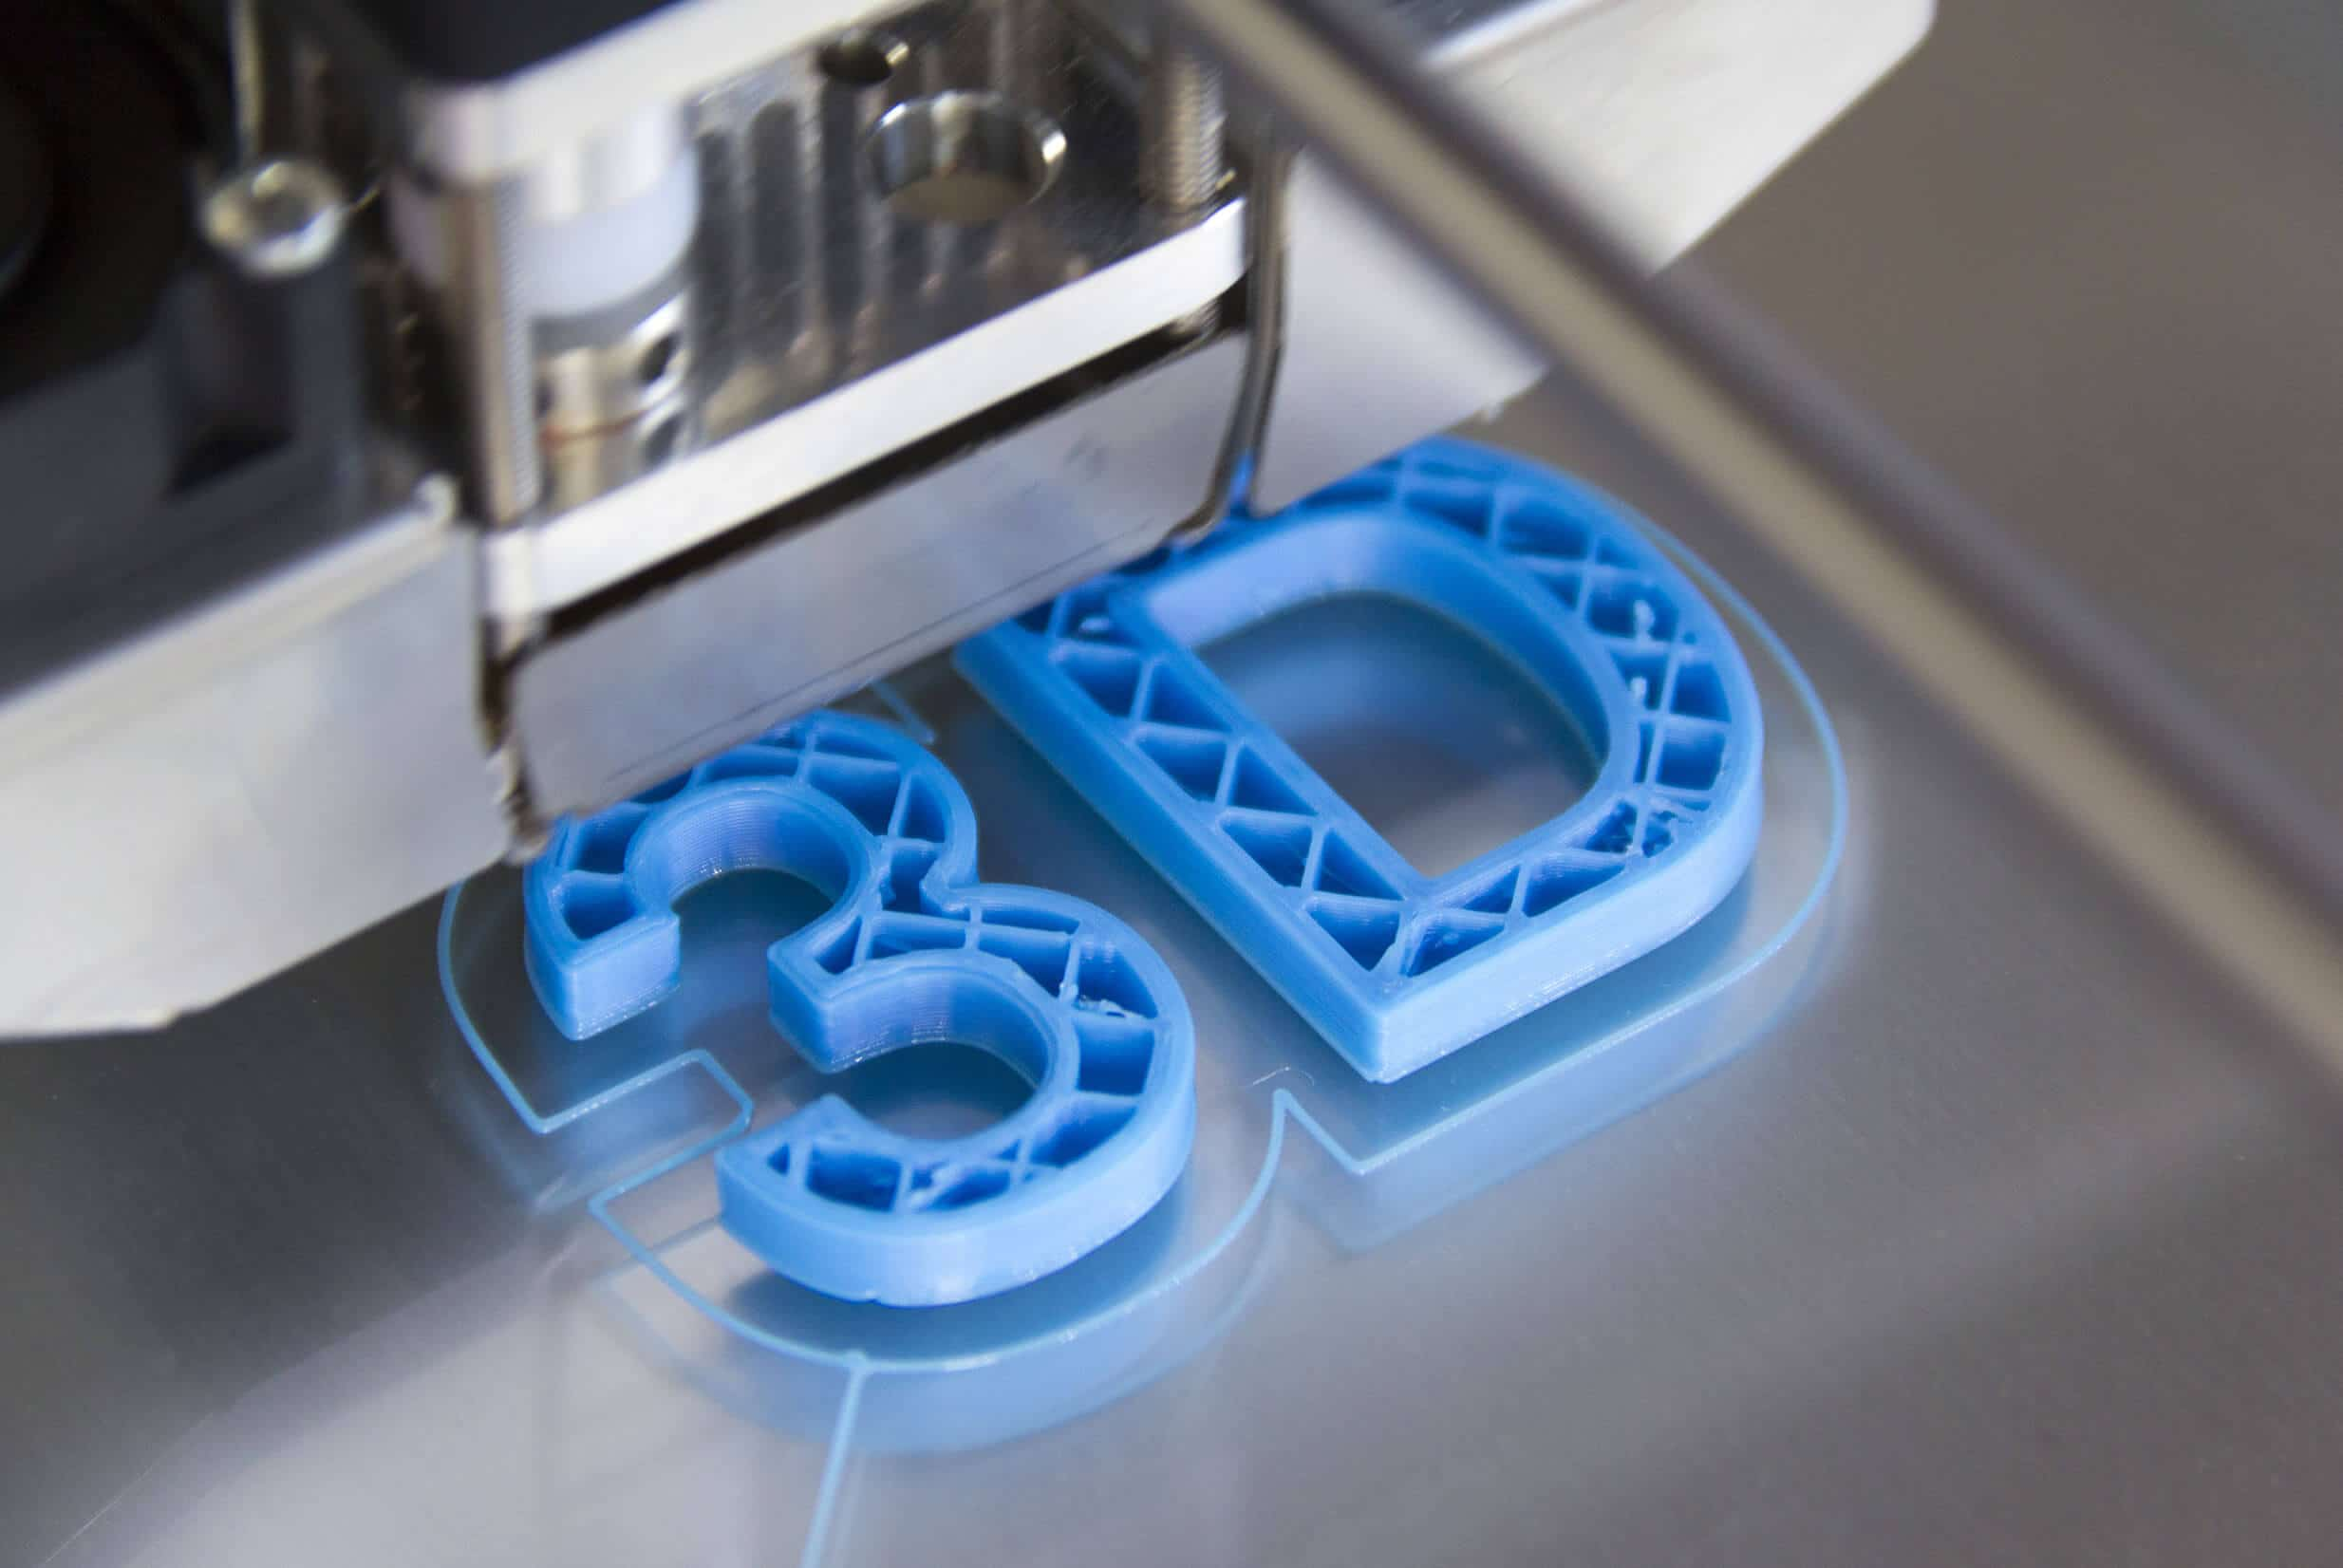 3D Printer Filament Inspection